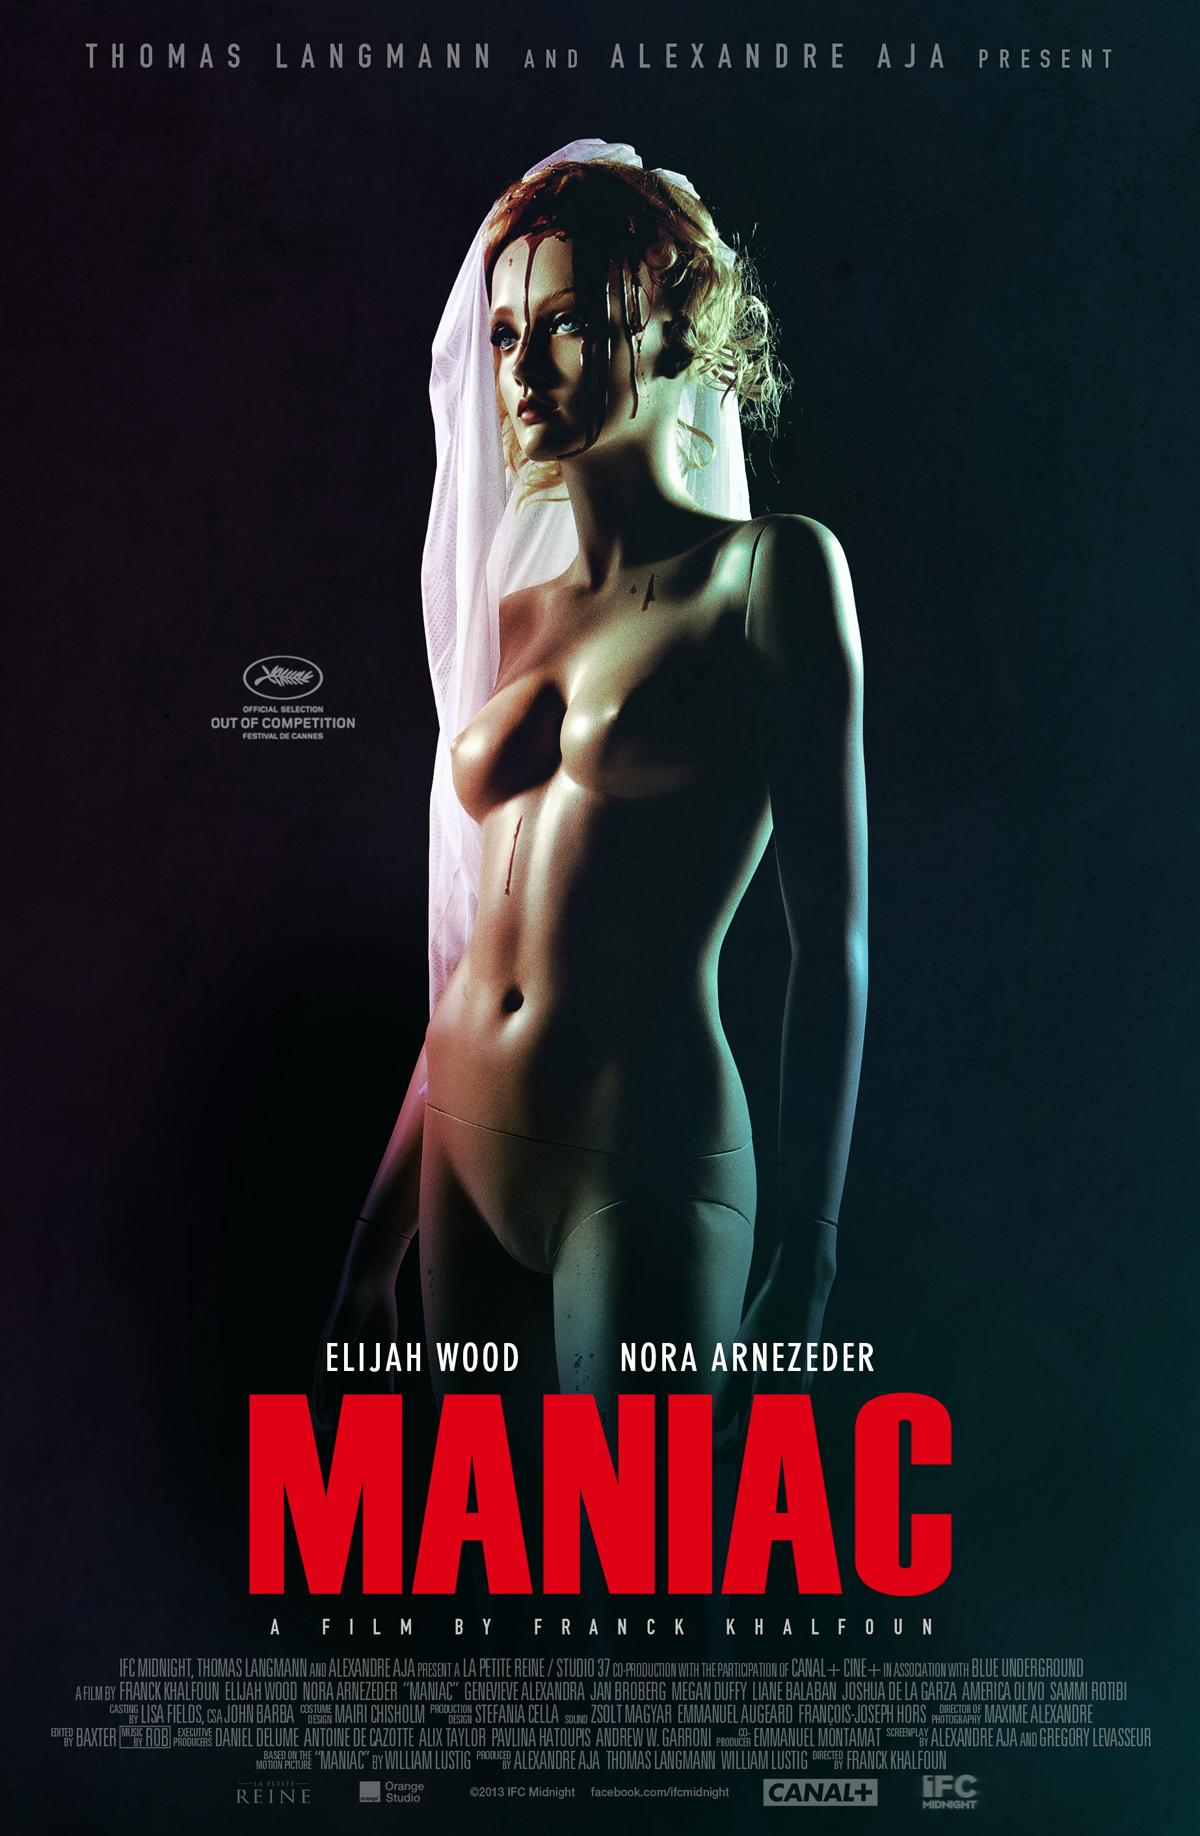 http://1.bp.blogspot.com/-wMozUYa7zlY/UZ1LPV4Gl4I/AAAAAAAAThM/FrrEkX8NO-o/s0/maniac-poster-exclusive.jpg